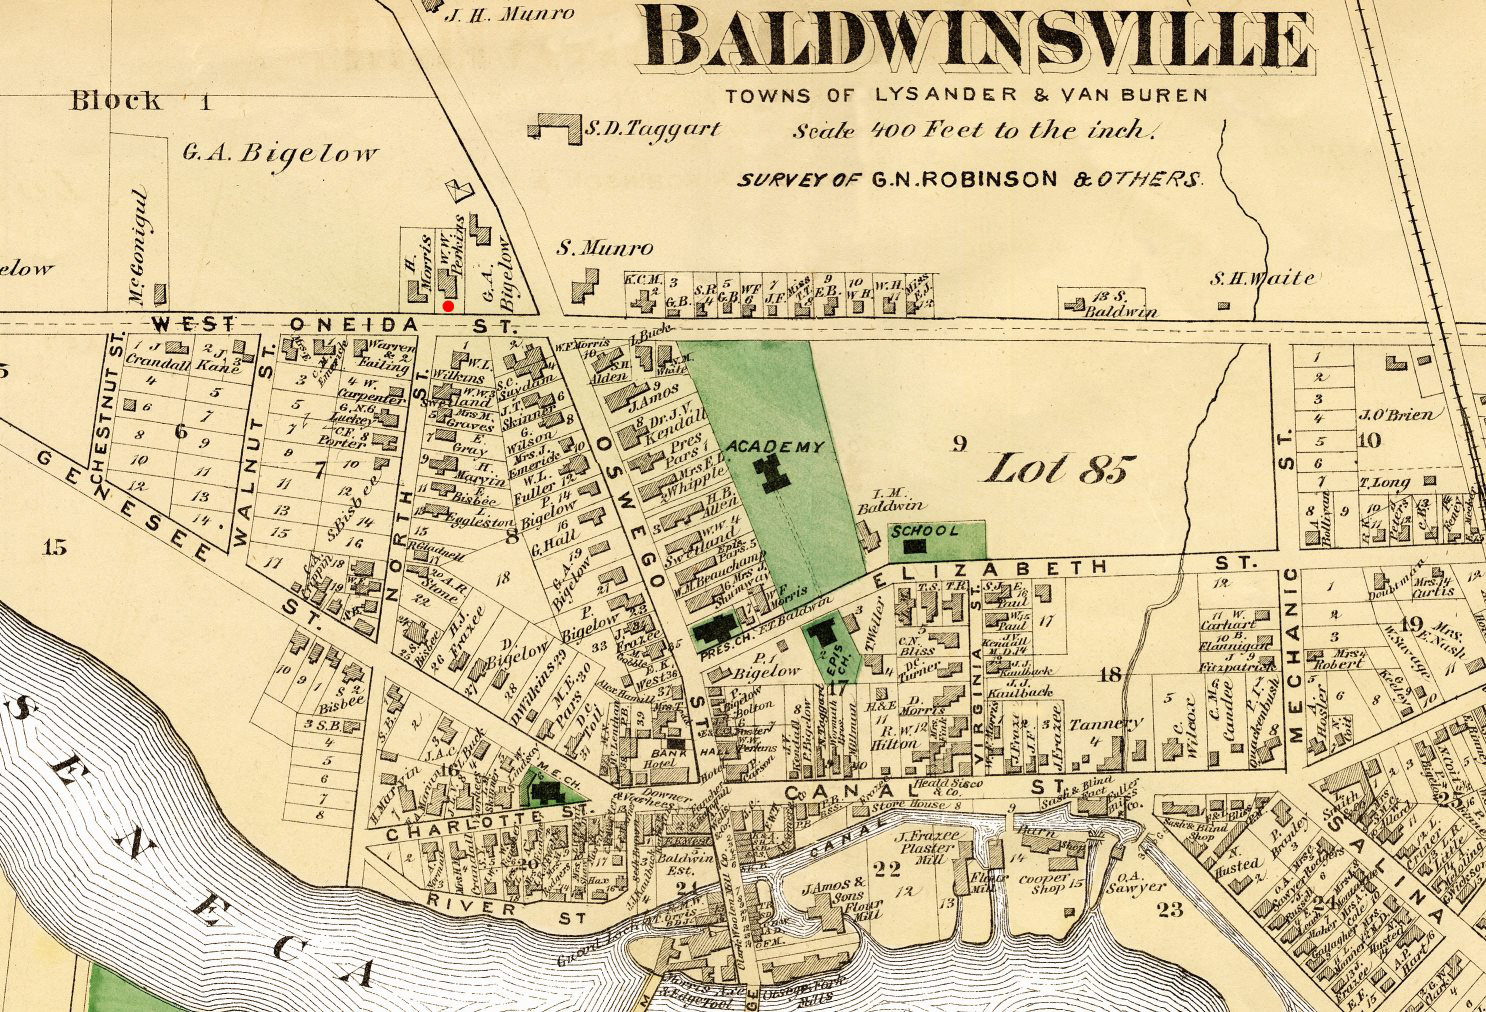 1875 Baldwinsville NY Map